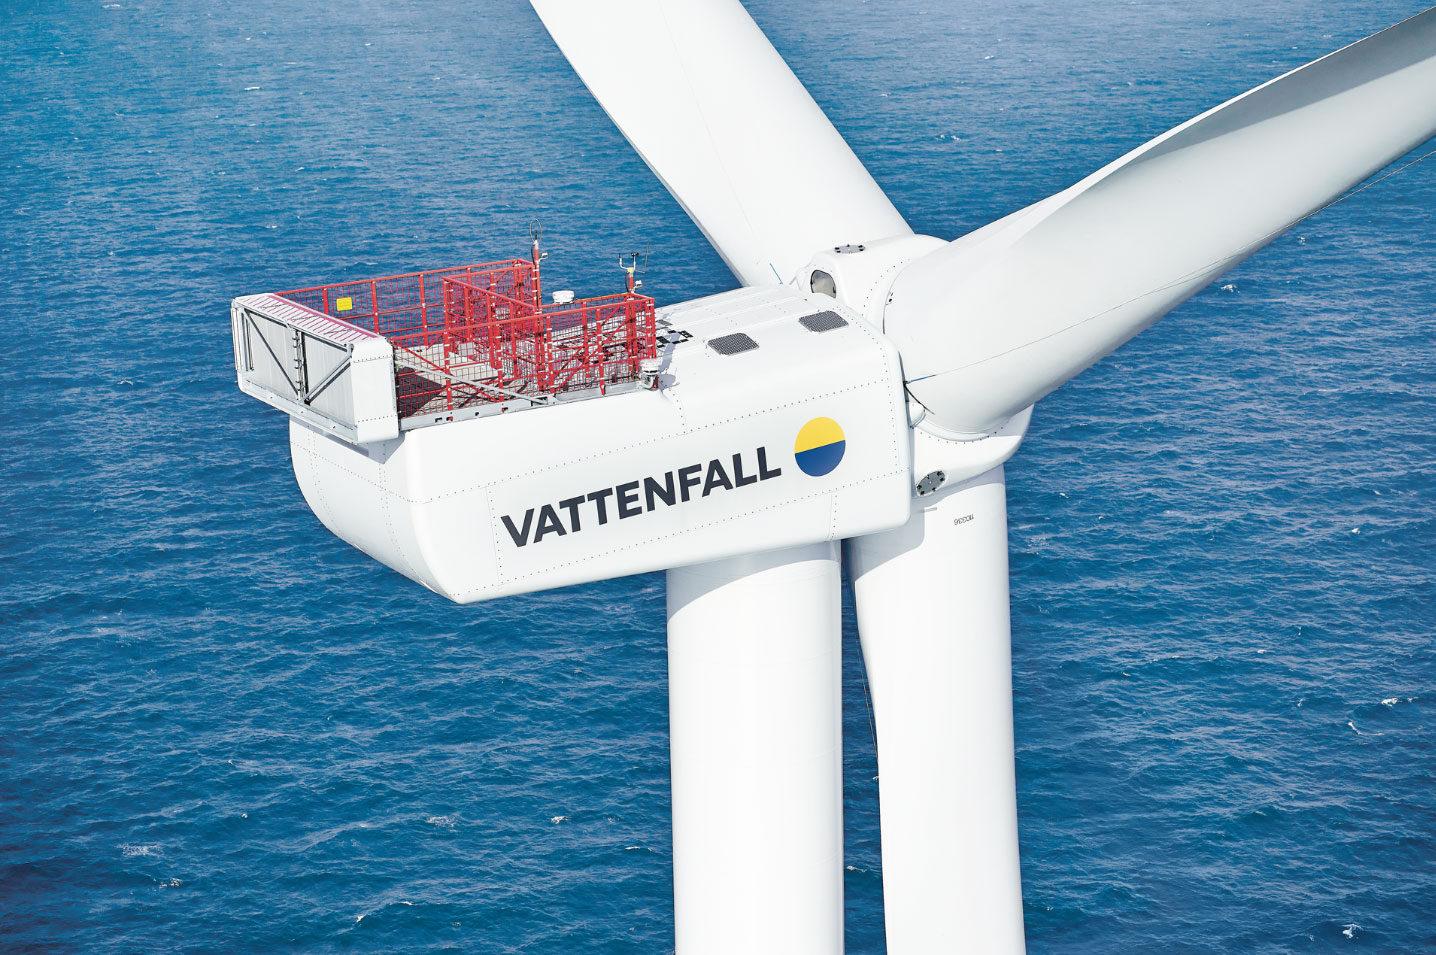 Company Image (Vattenfall: RAS7531 Offshore Wind Turbine)